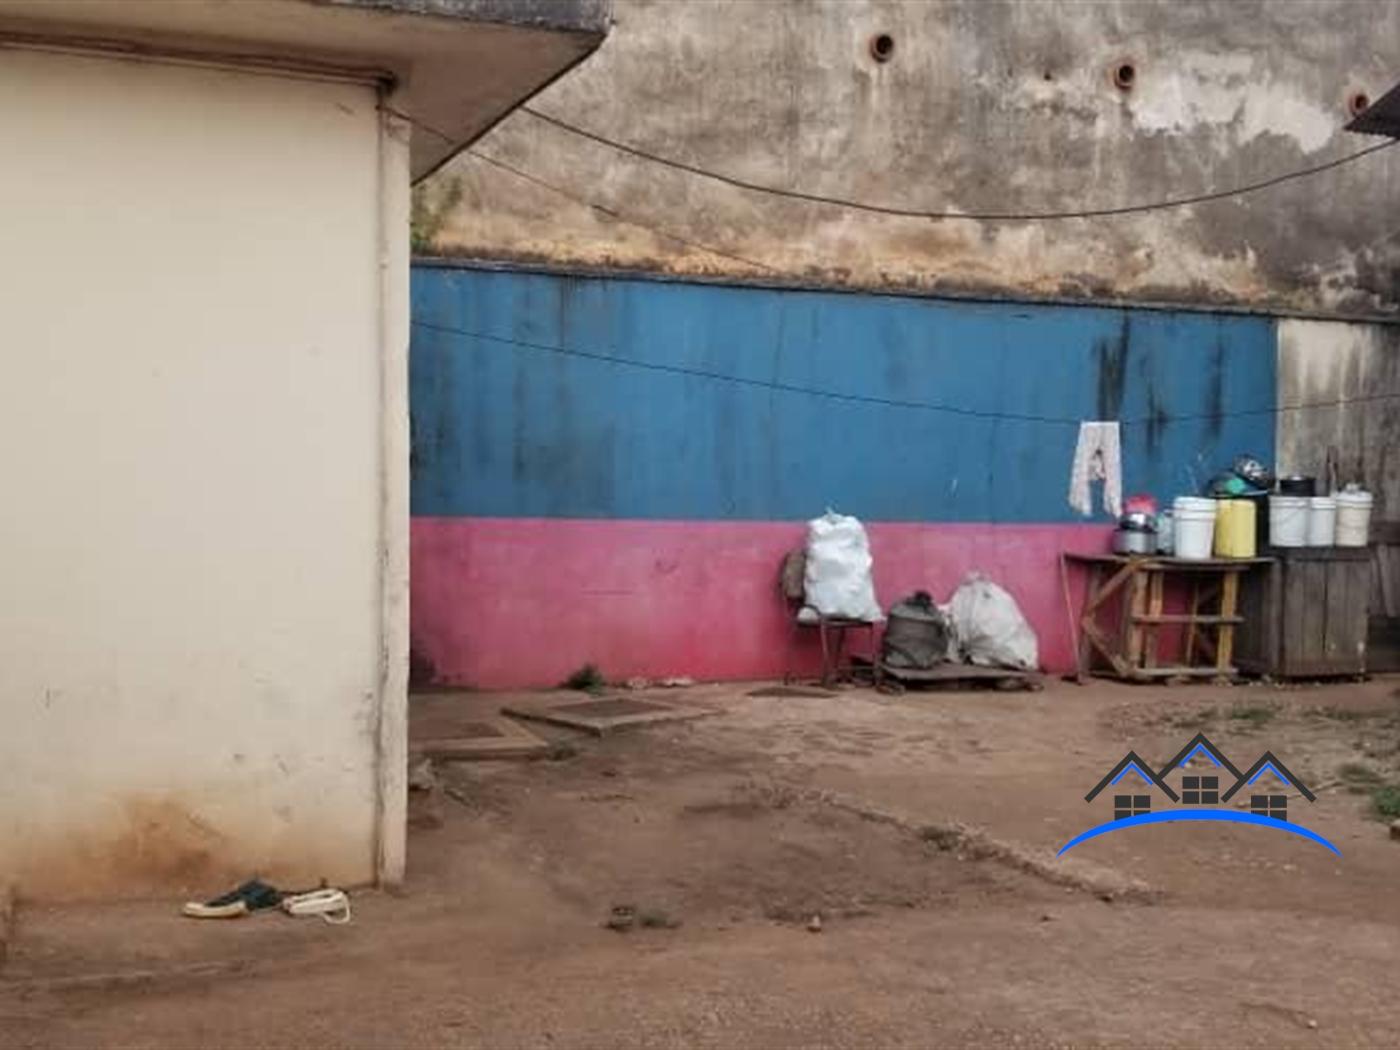 Warehouse for sale in Industrialarea Kampala